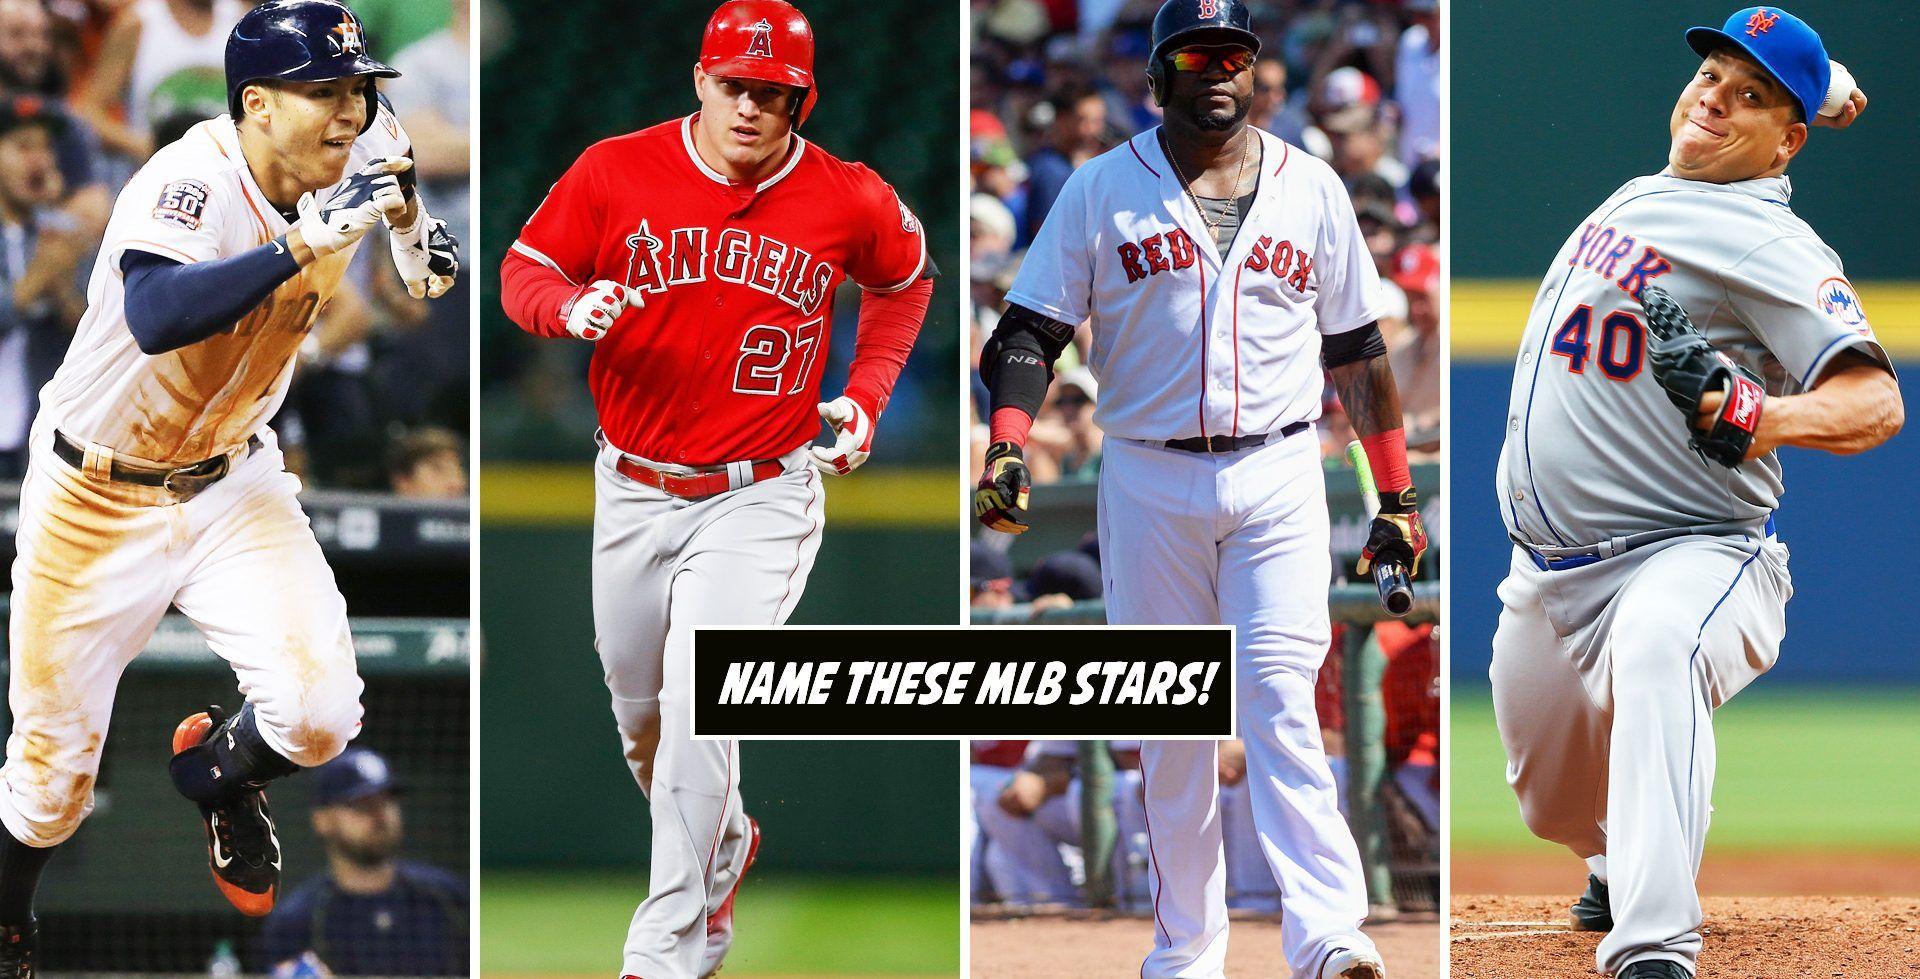 Major league baseball player images